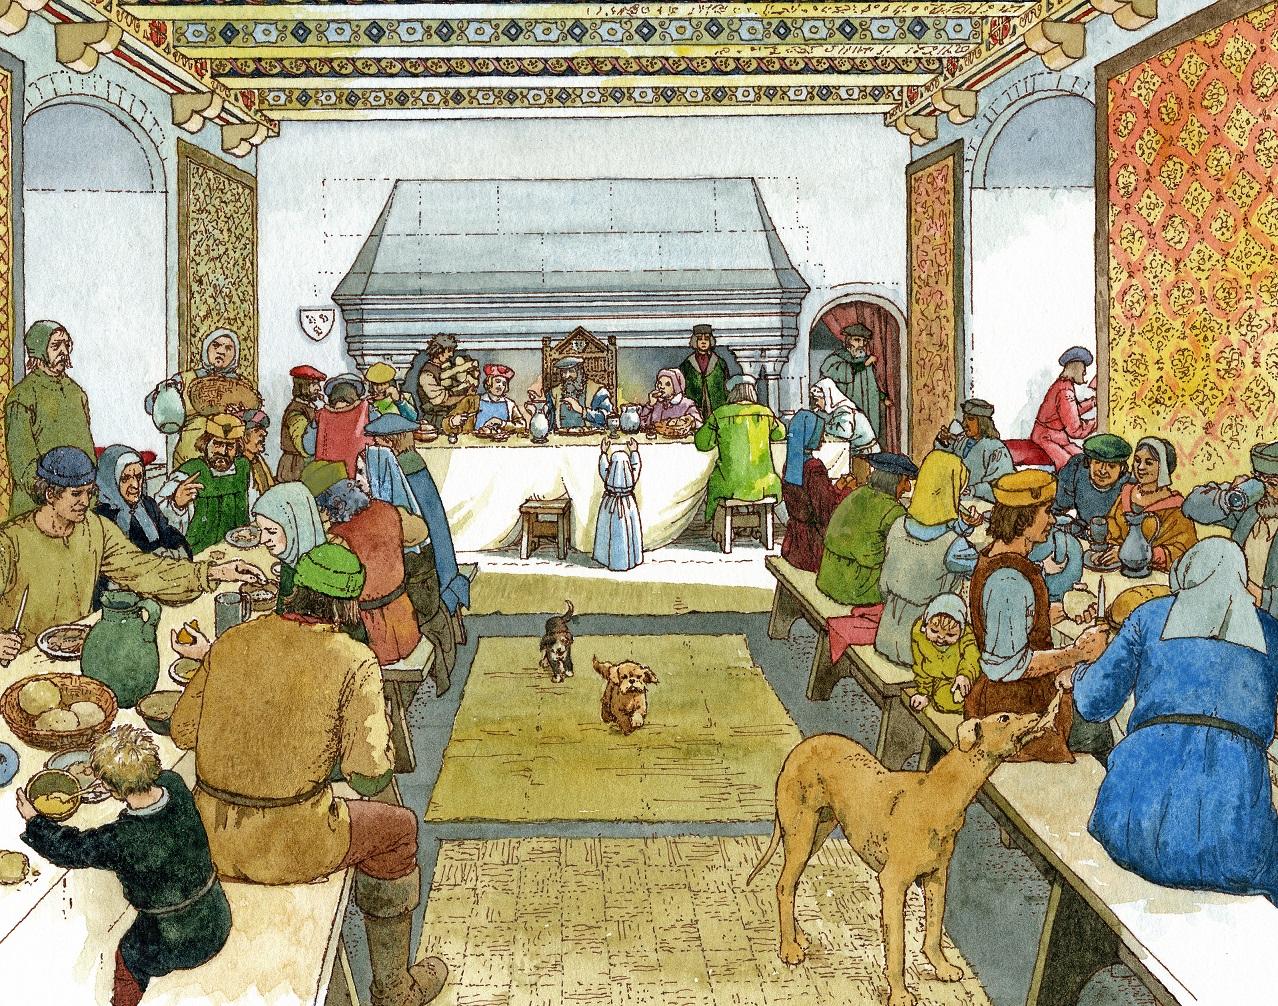 An artist's impression of a 16th century feast in Craigmillar Castle